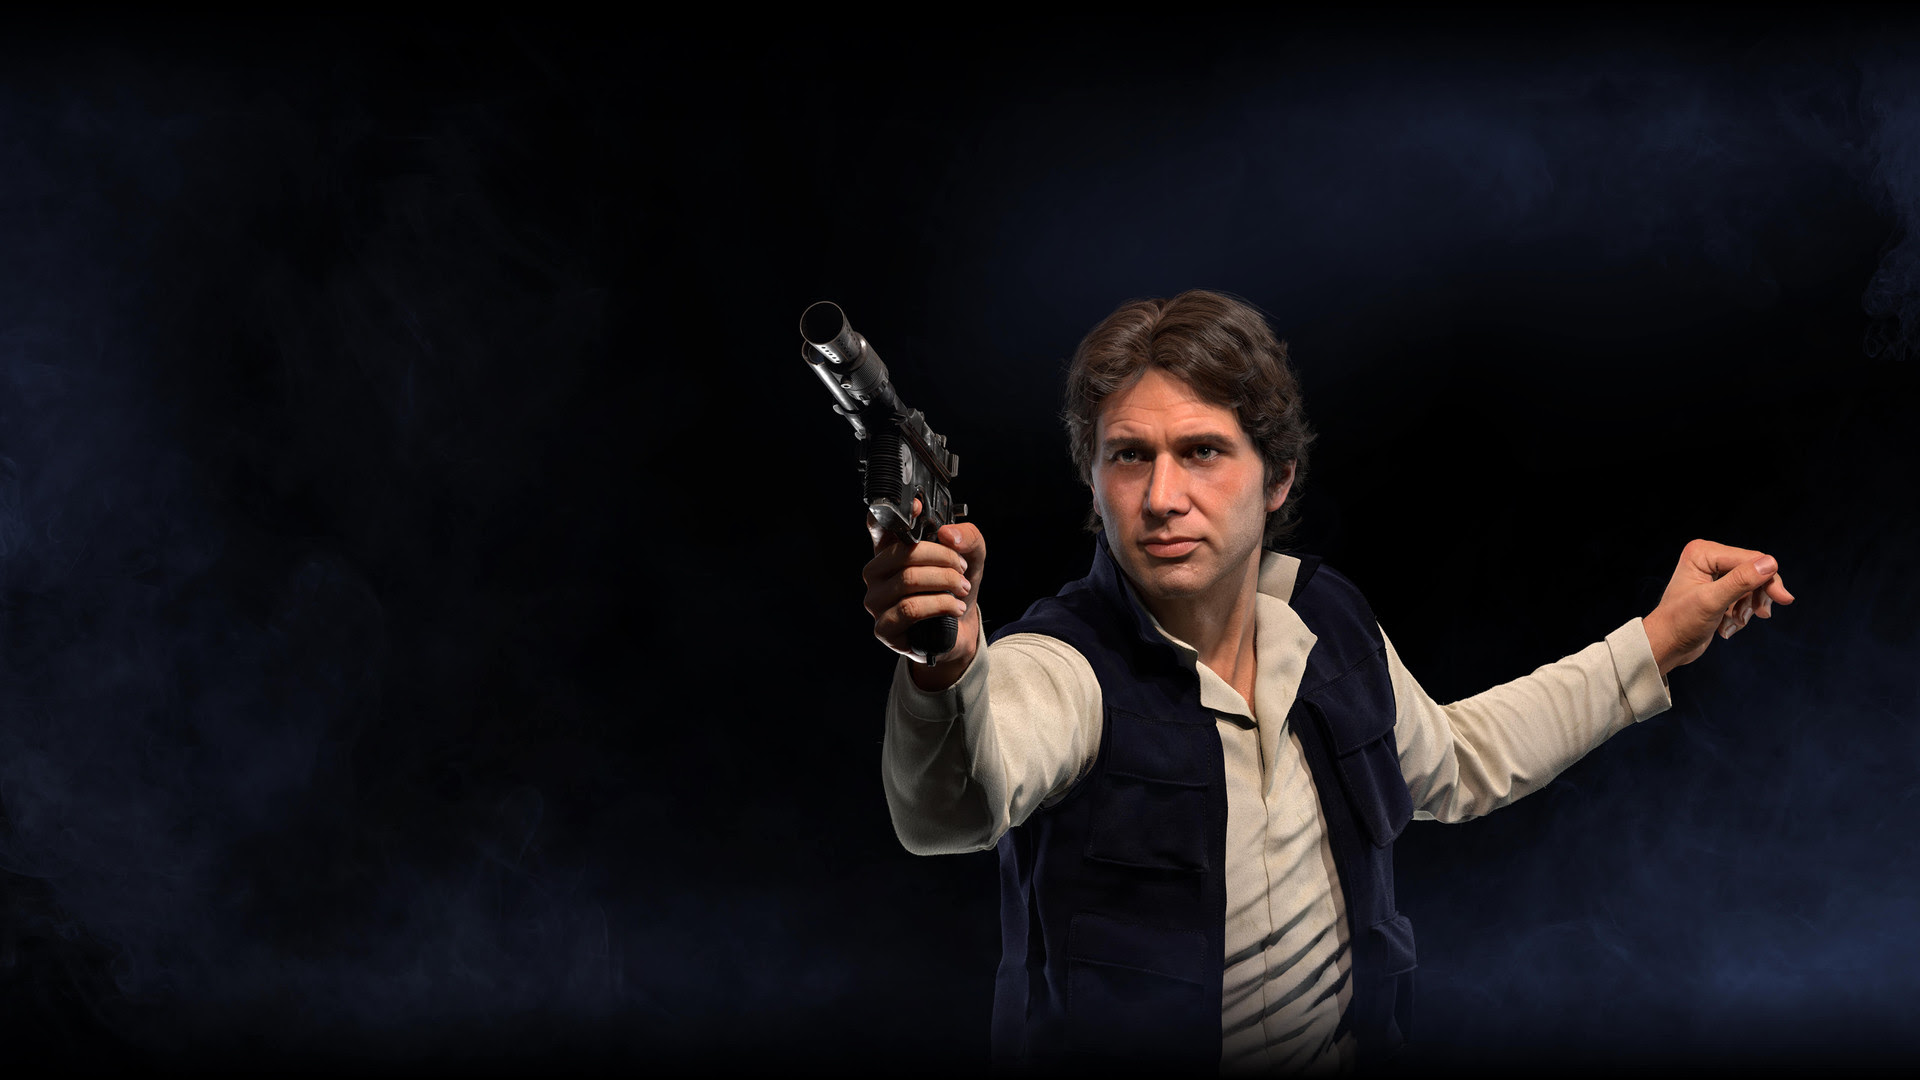 Han Solo Wallpaper 64 Images